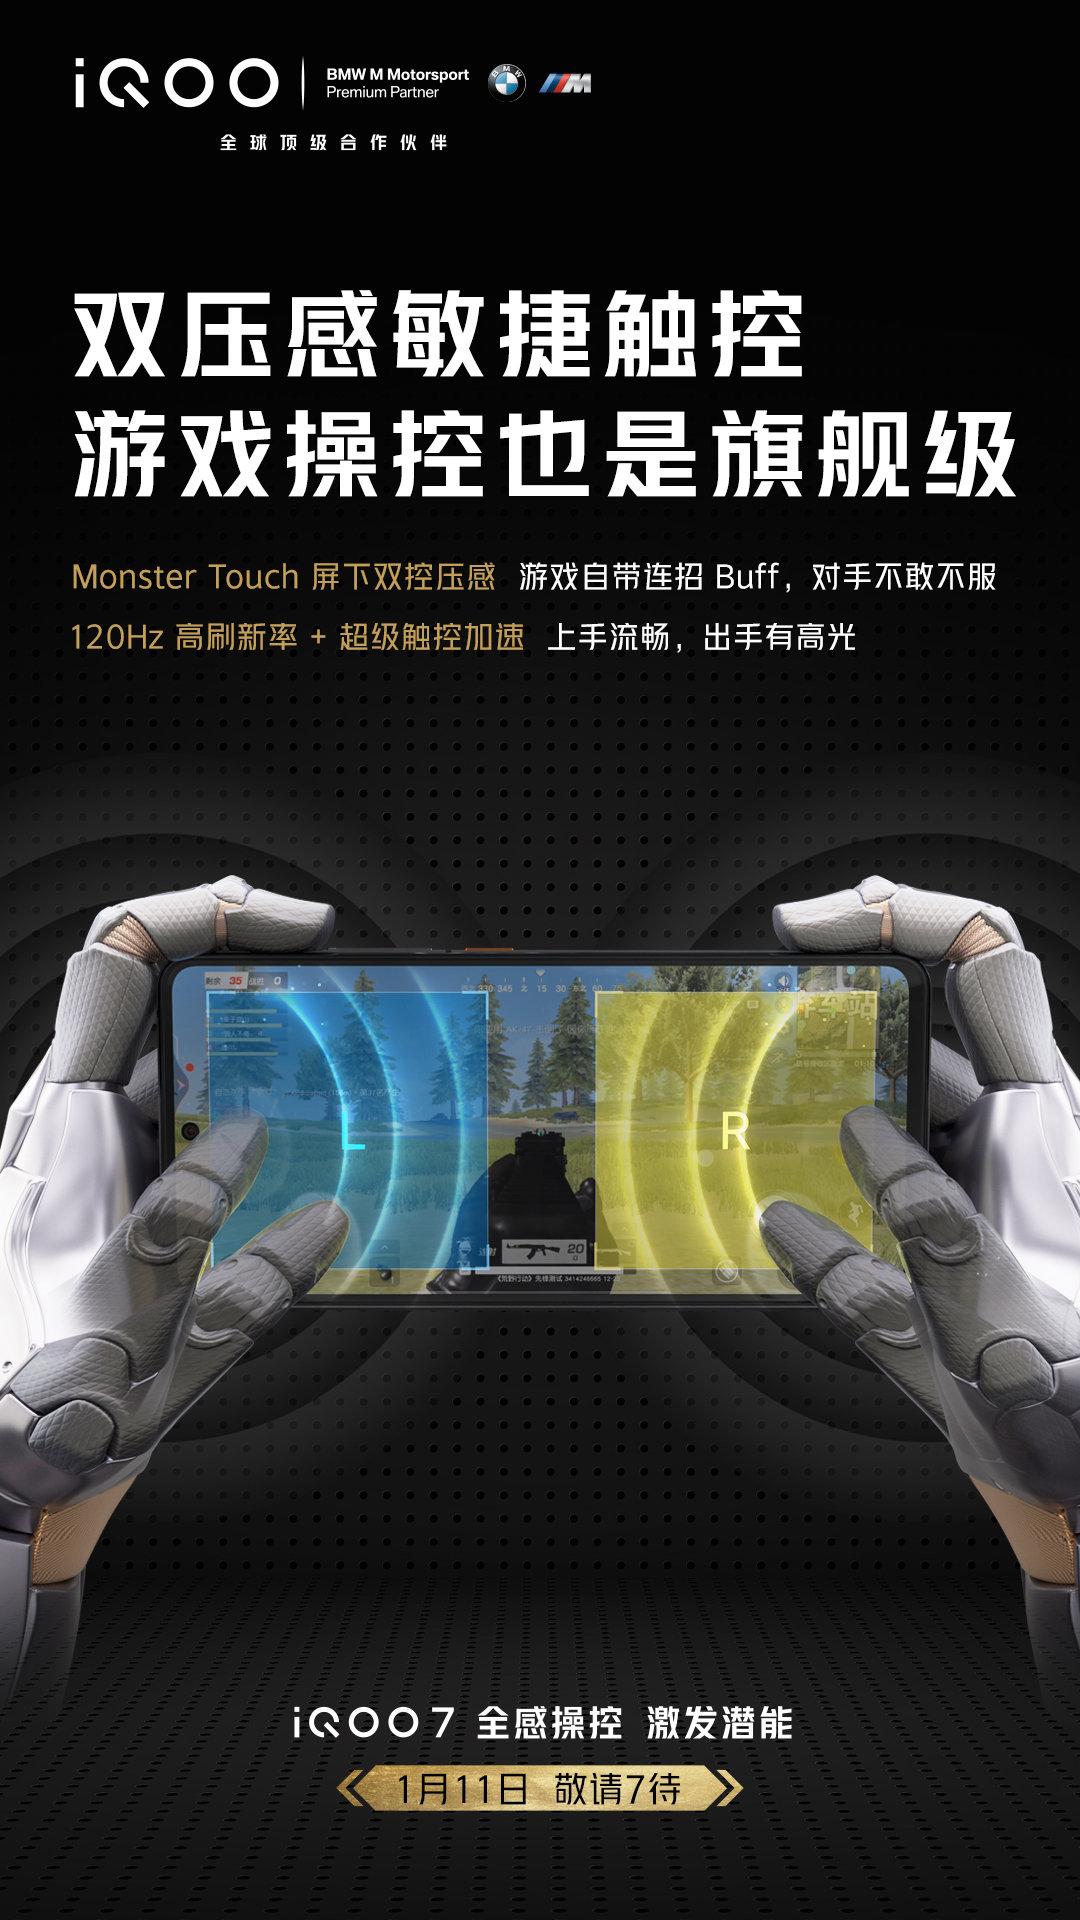 iQOO 7 操控升级:双压感灵敏触控 + 120Hz 刷新率 - 热点资讯 每日推荐 第2张